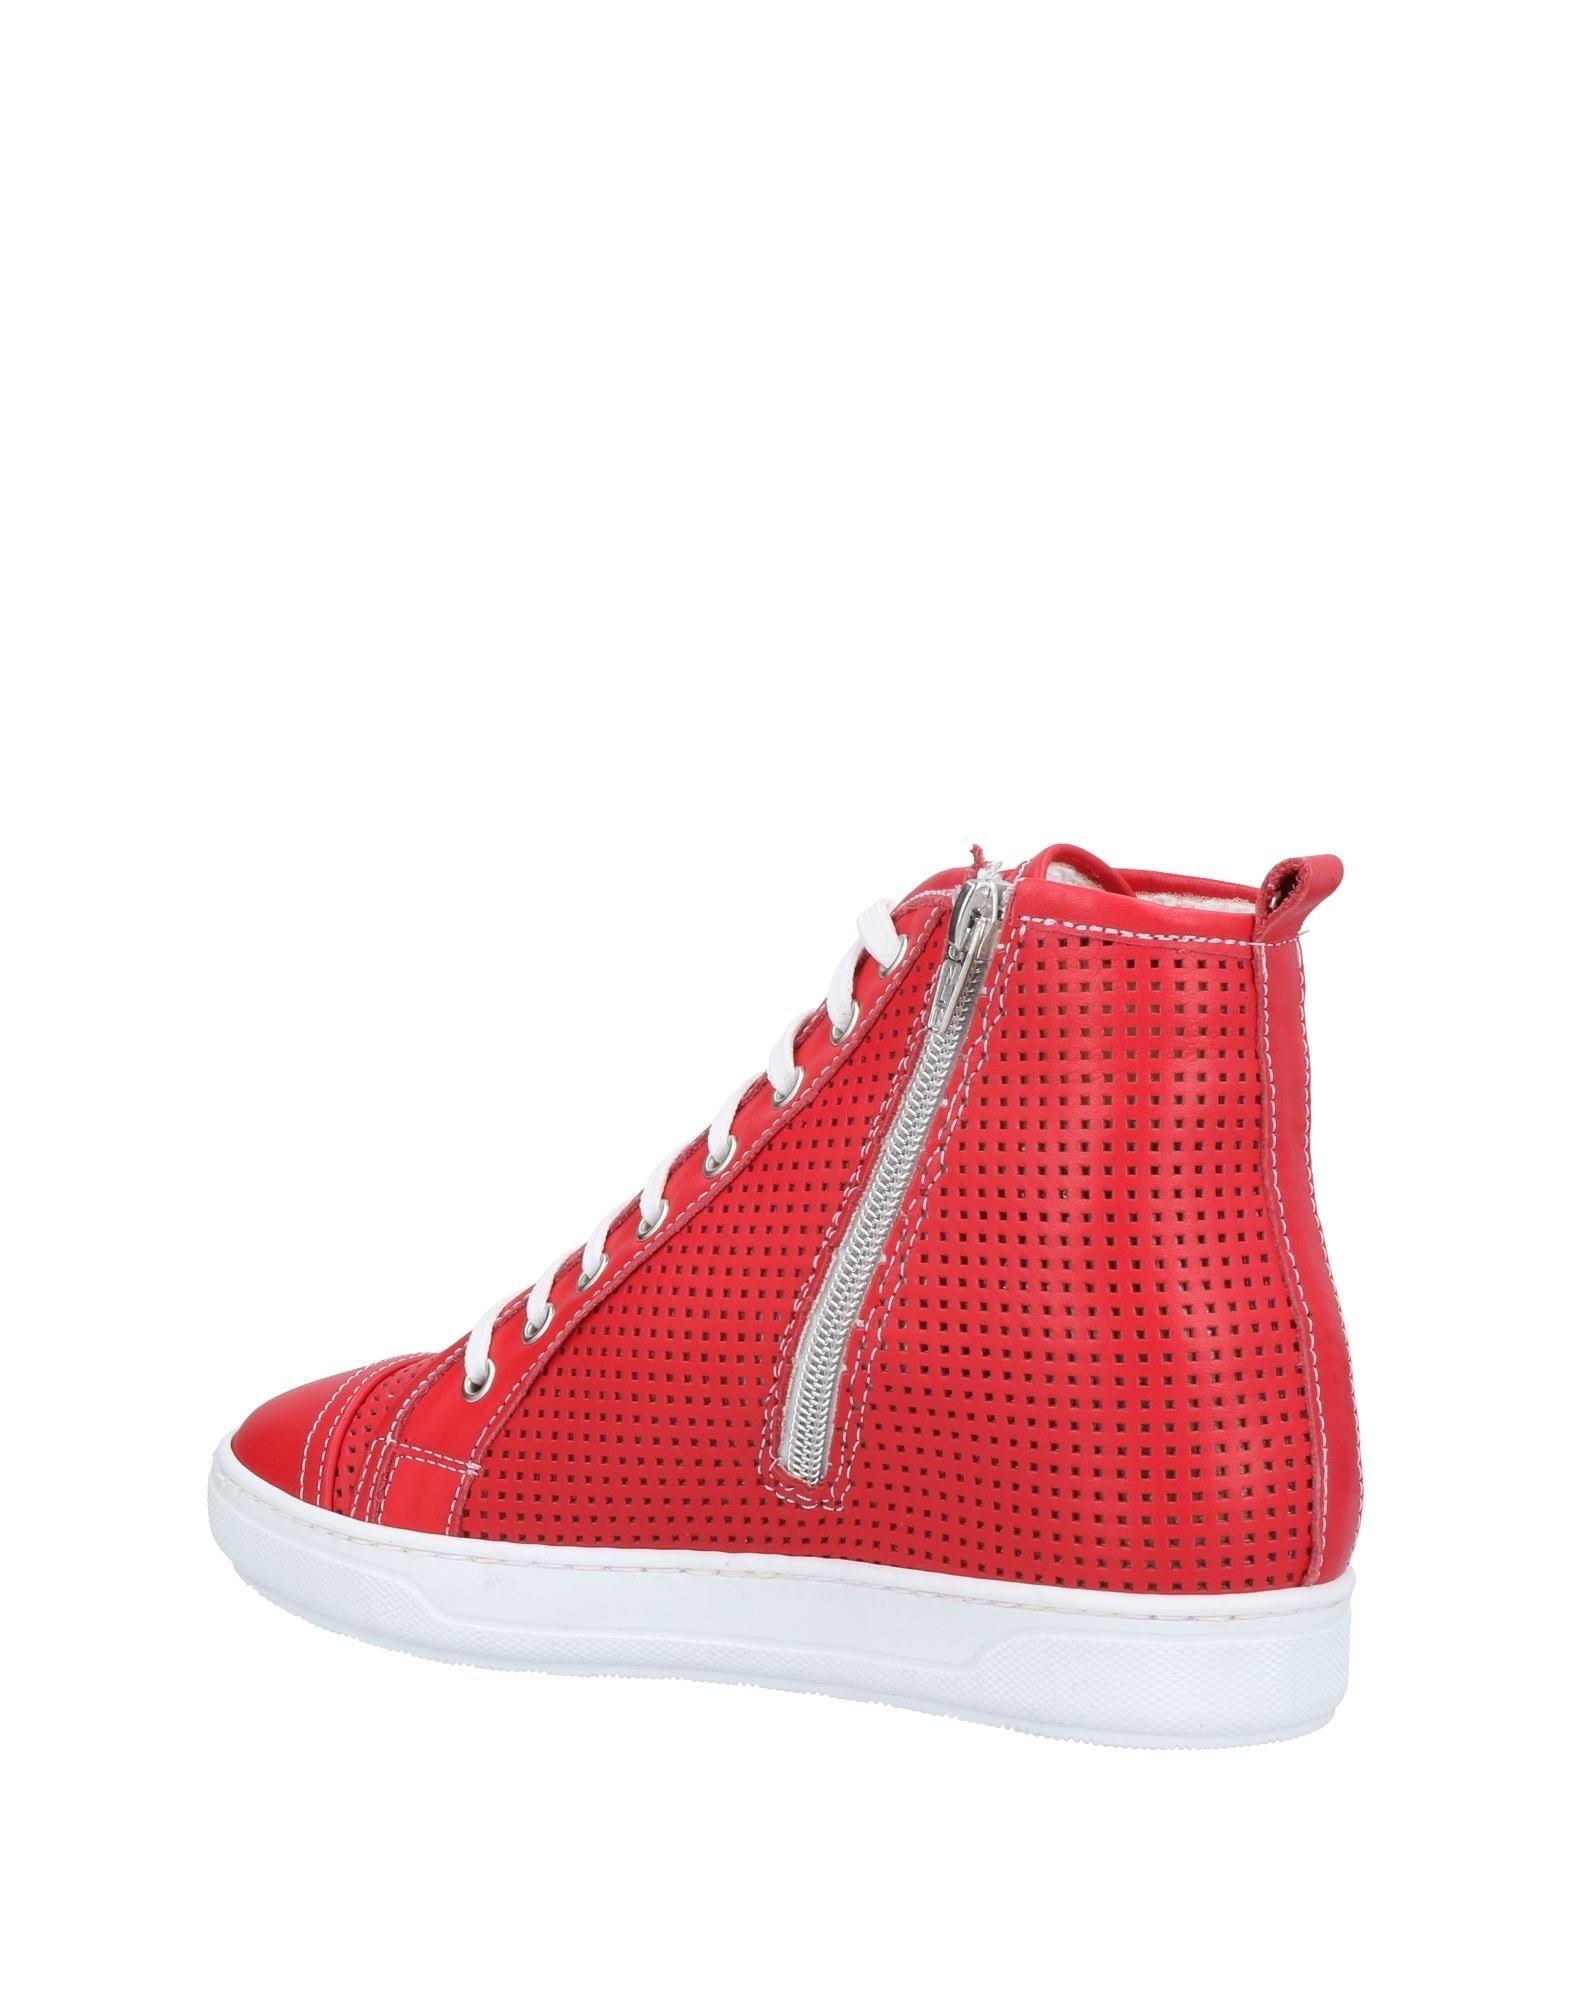 Geneve Sneakers Damen  11467712WK 11467712WK 11467712WK Gute Qualität beliebte Schuhe a77bbe